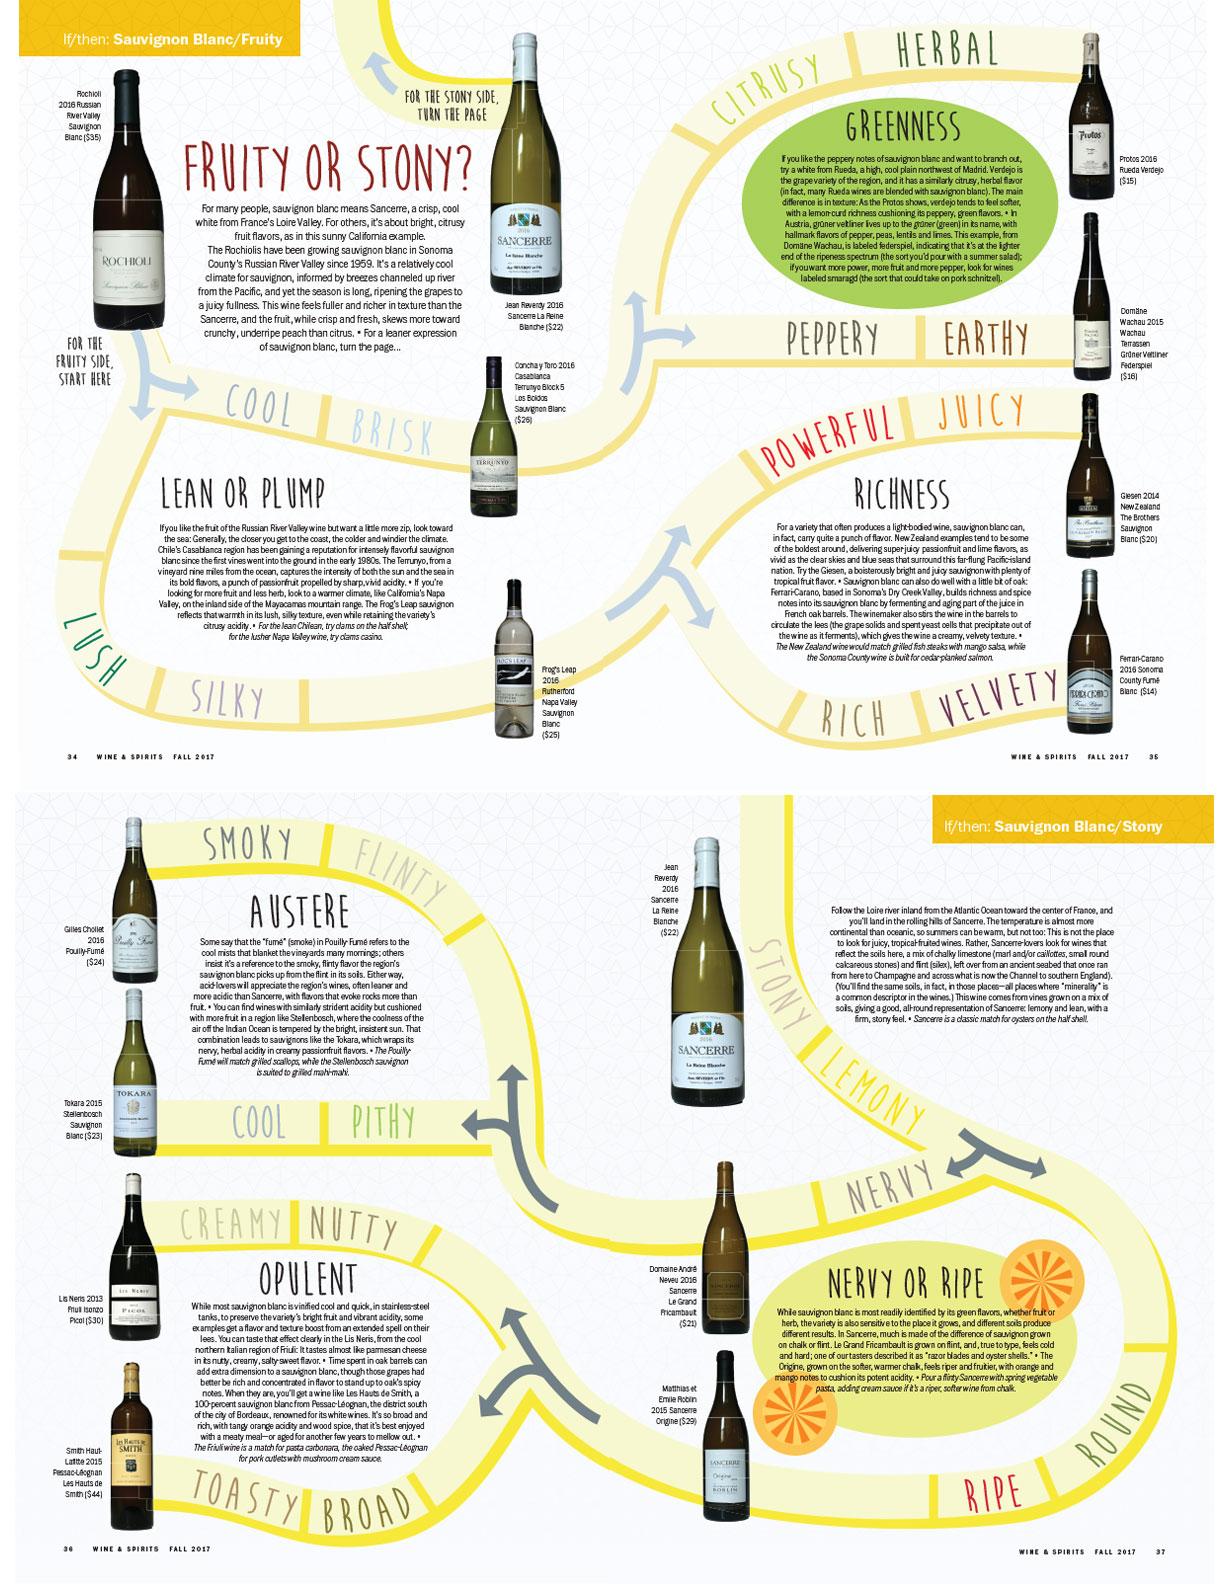 Copy of Wine & Spirits Fall 2017 Spread: If/Then Sauvignon Blanc